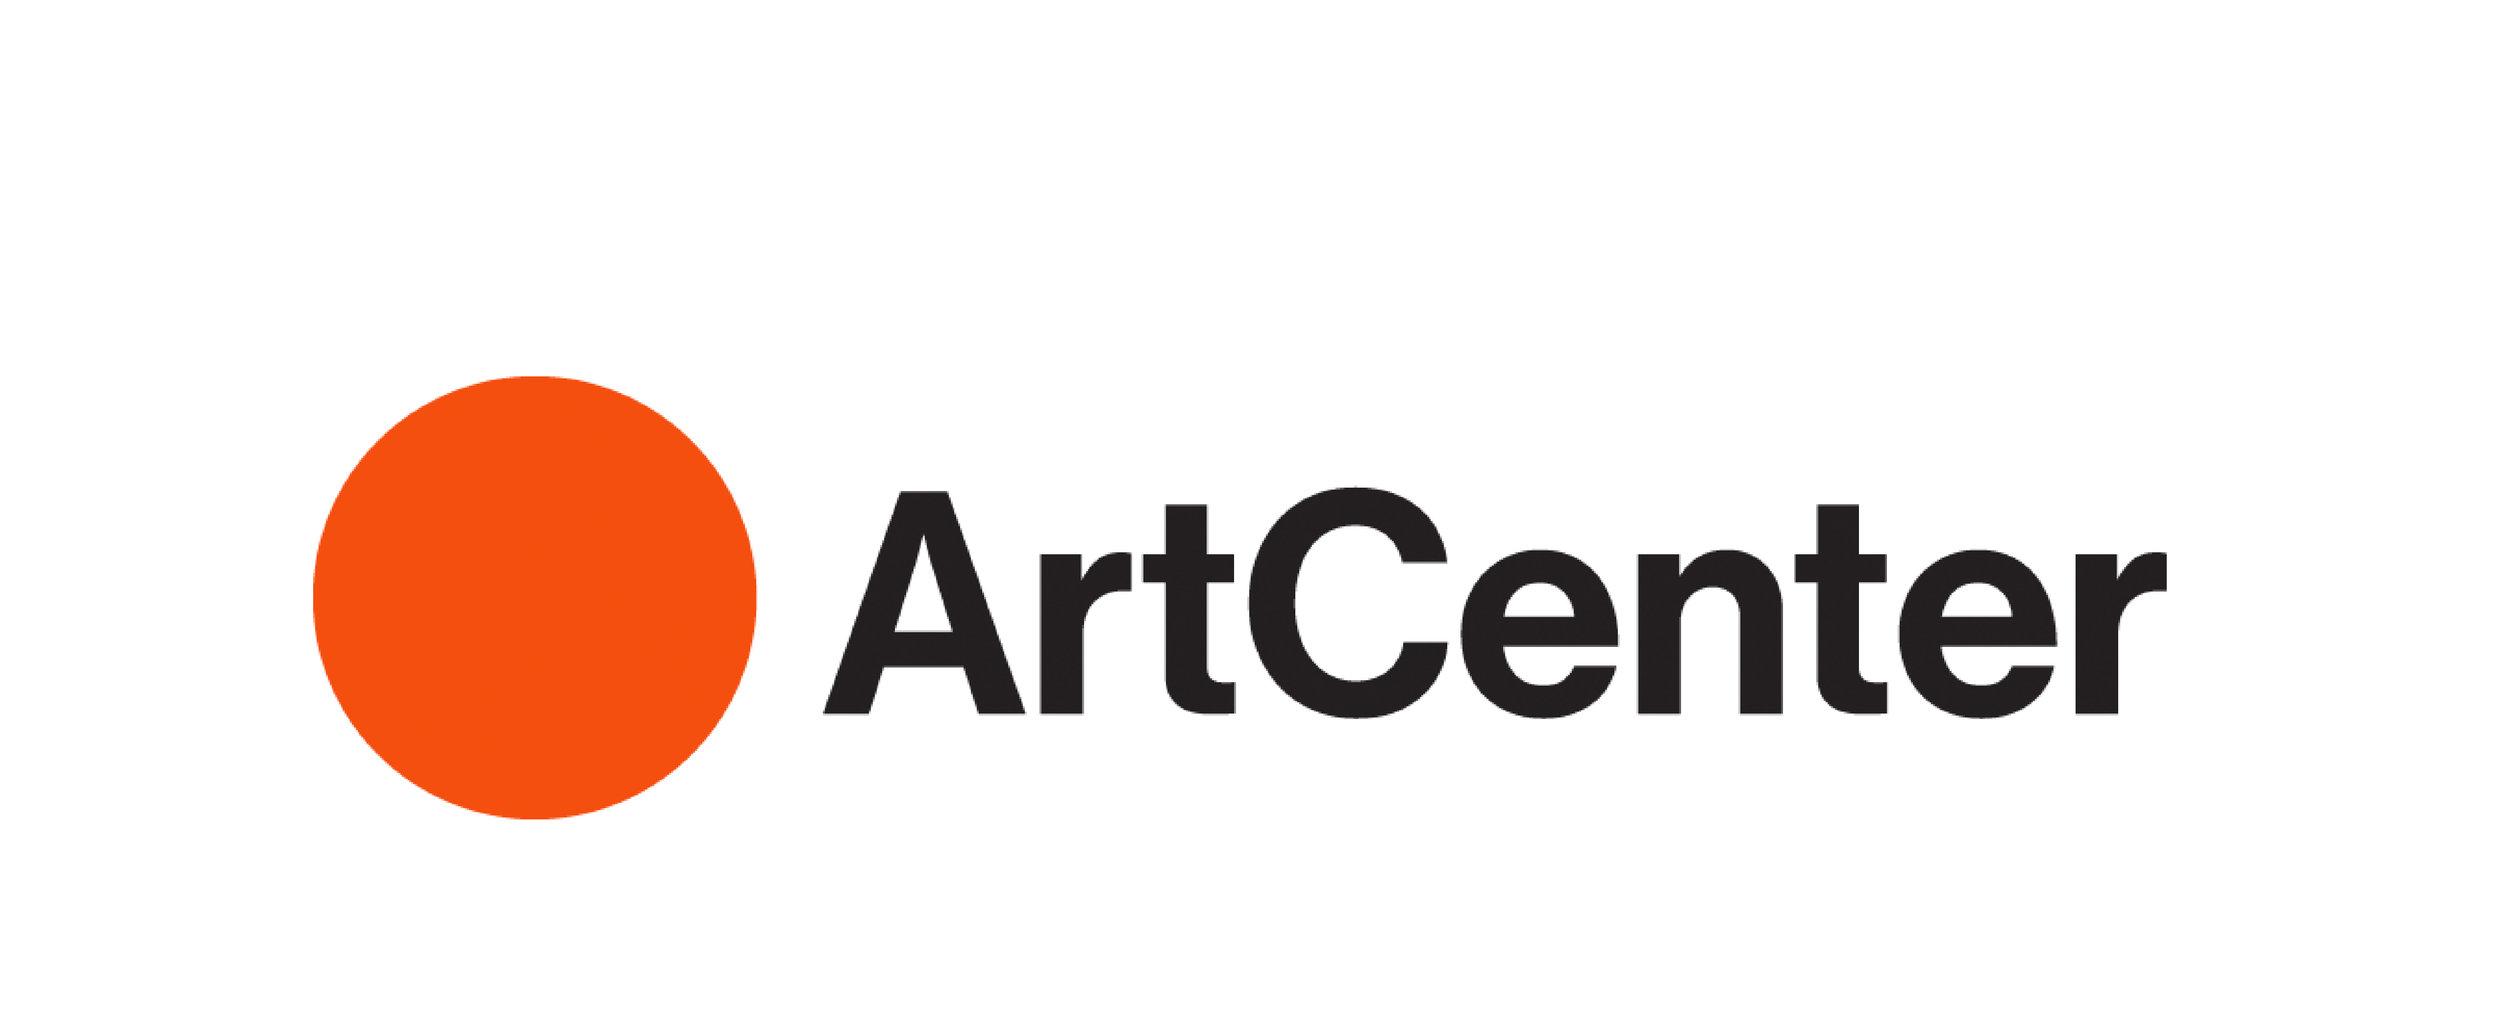 ArtCenter – Designmatters